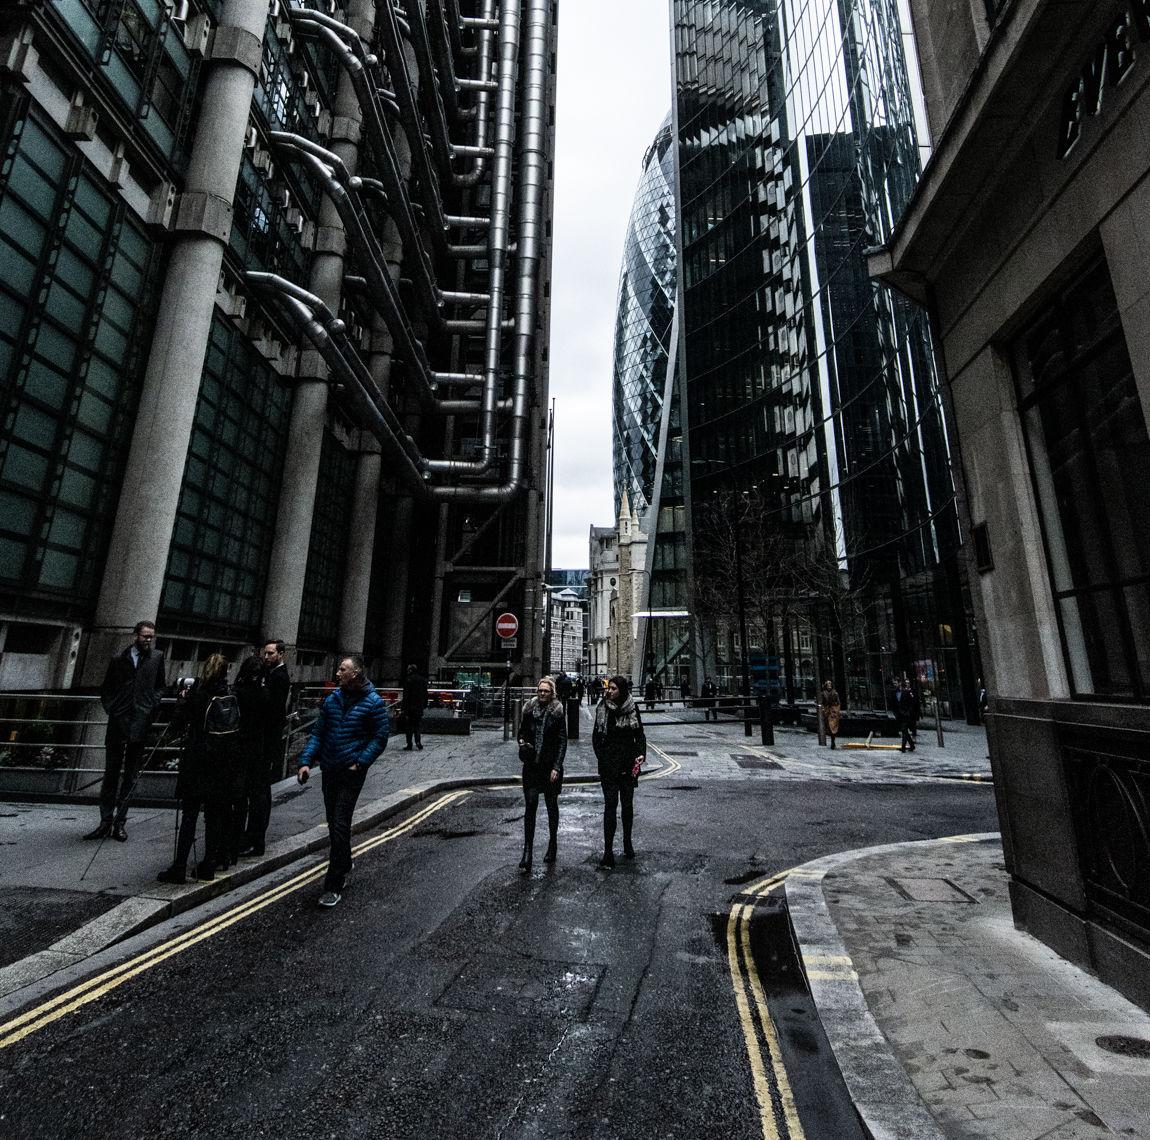 The modern City of London